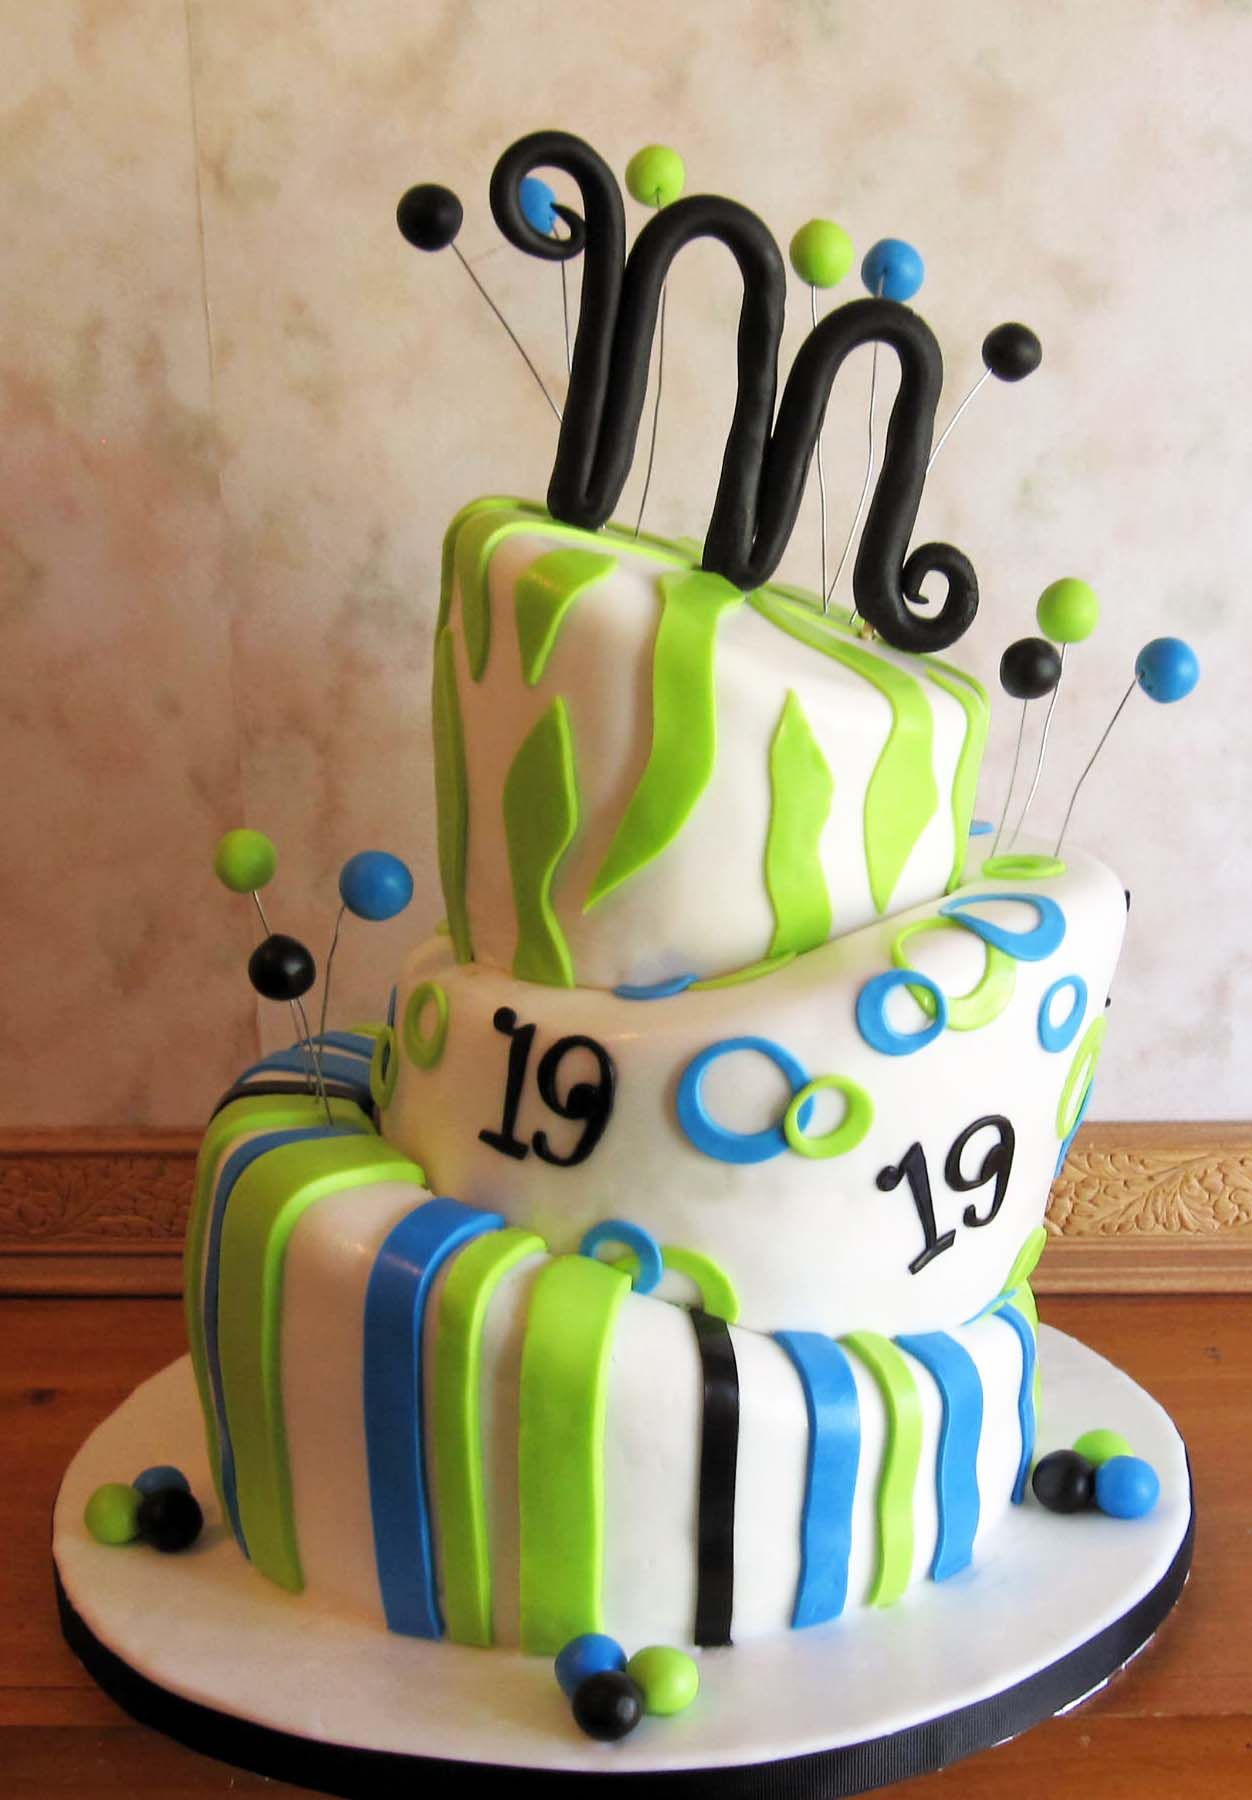 3 Tier Topsy Turvy 19th Birthday Cake 19th birthday